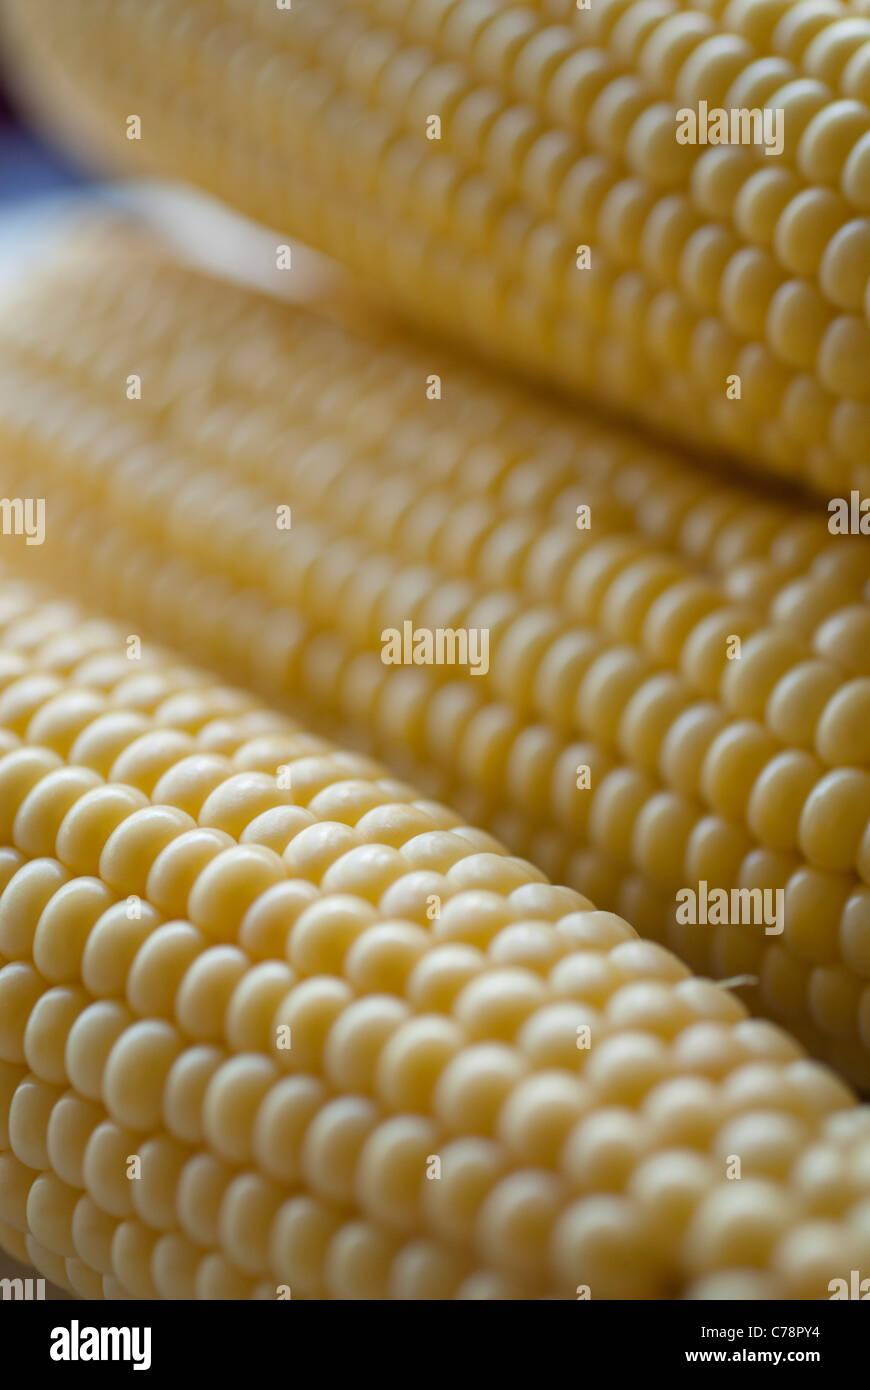 corn on a cob close-up - Stock Image